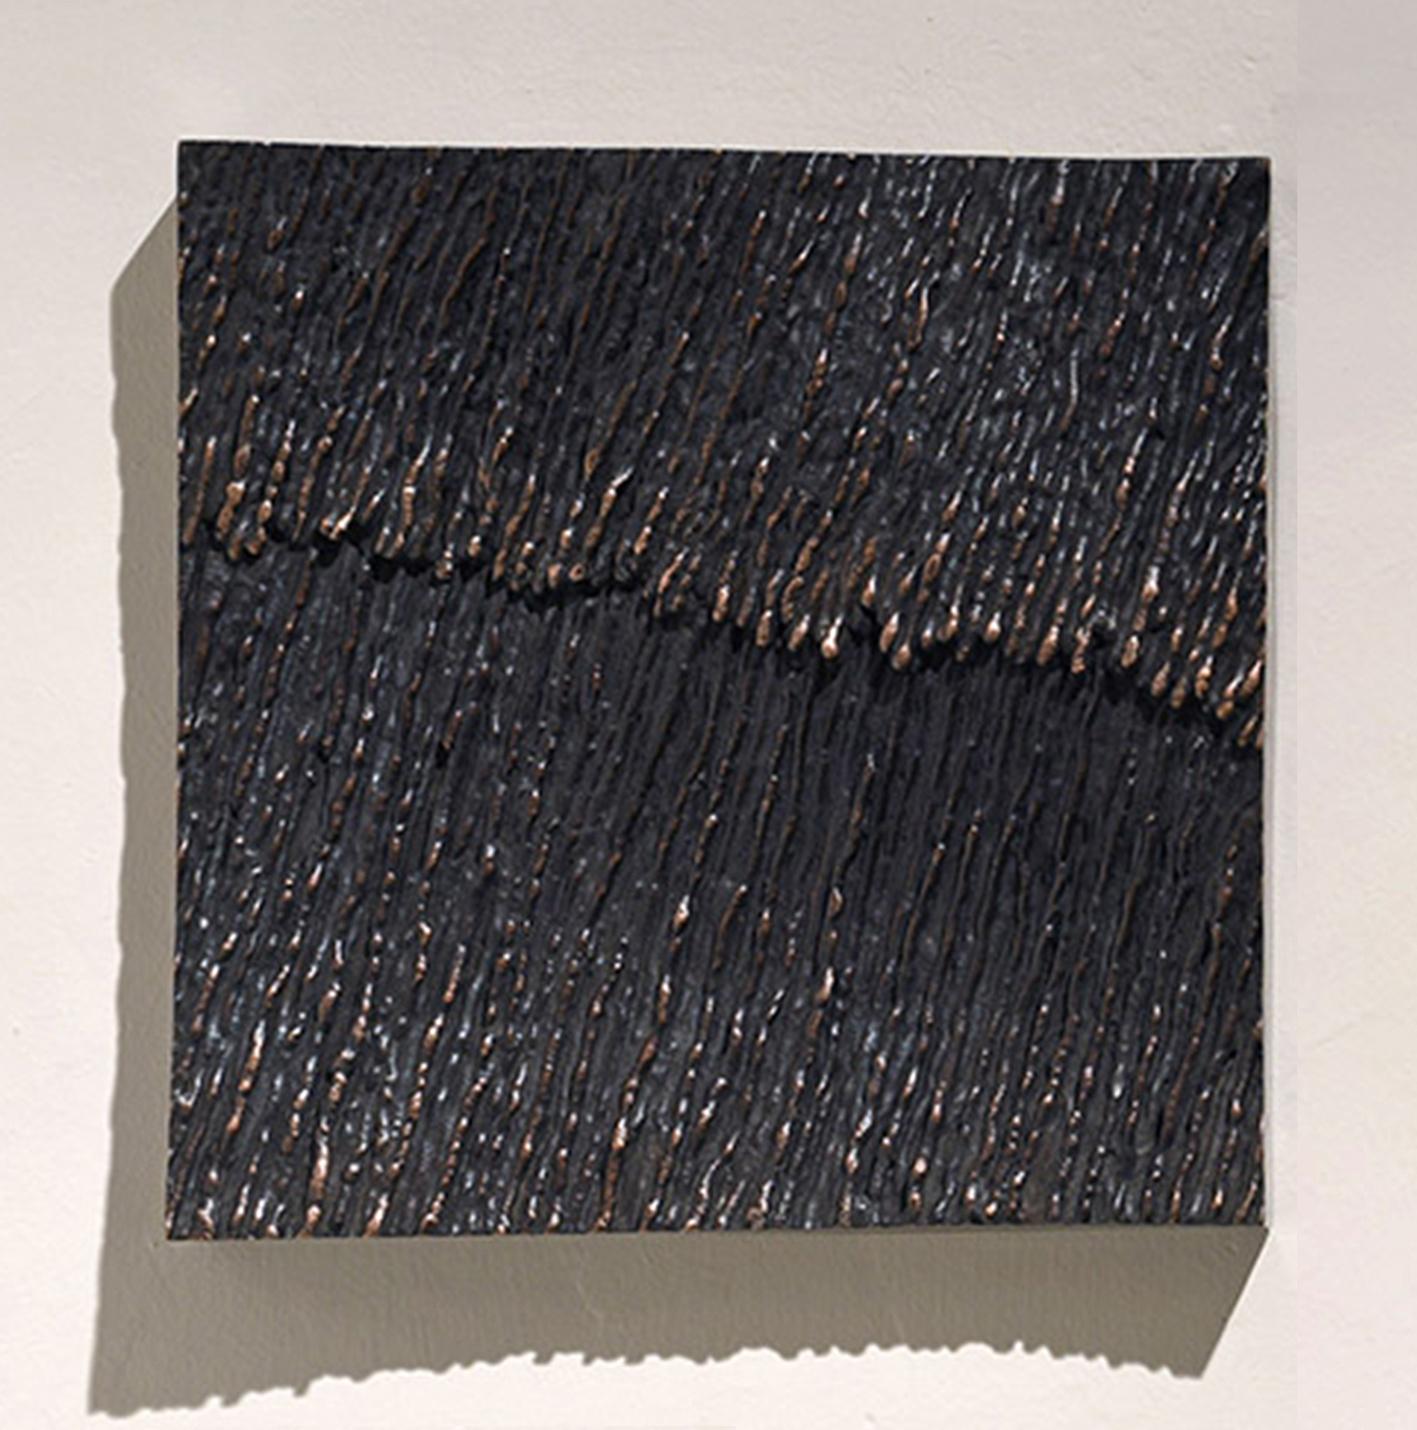 Déšť I., 30x30 cm, bronz, 45 000 Kč (bez DPH)